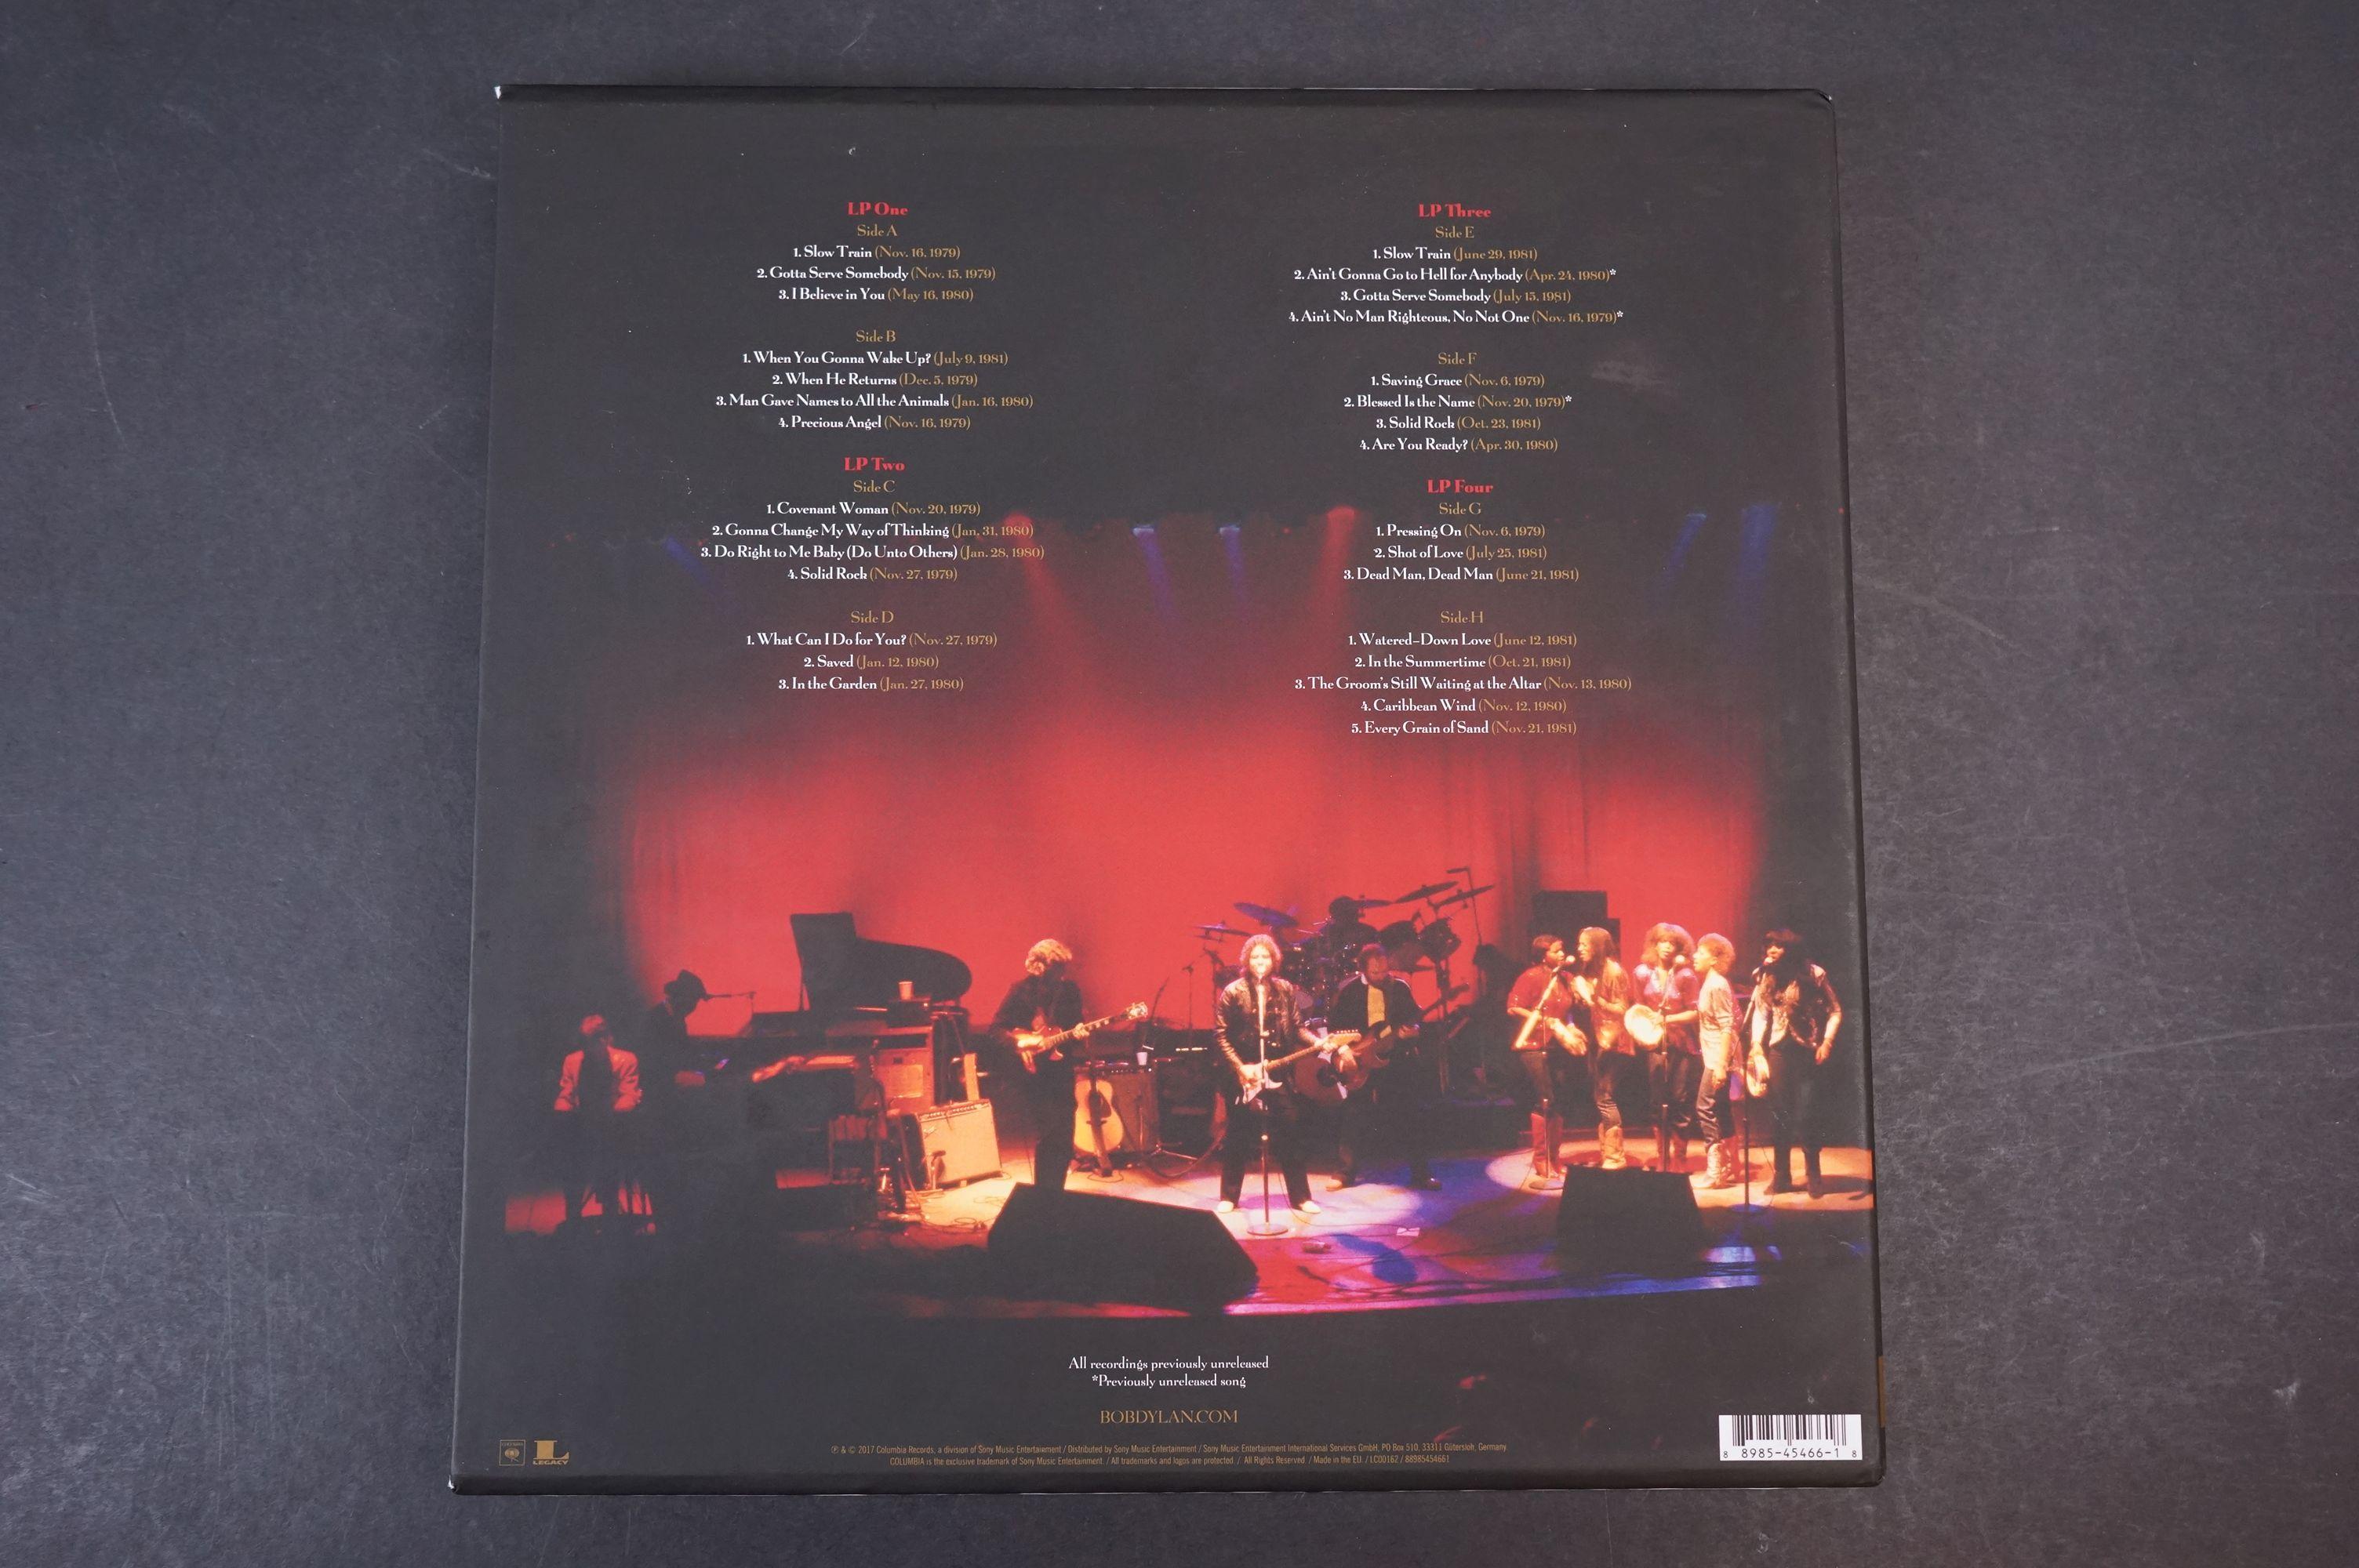 Vinyl - Bob Dylan Trouble No More The Bootleg Series vol 13 1979-1981 4 LP Box Set, ex - Image 9 of 9